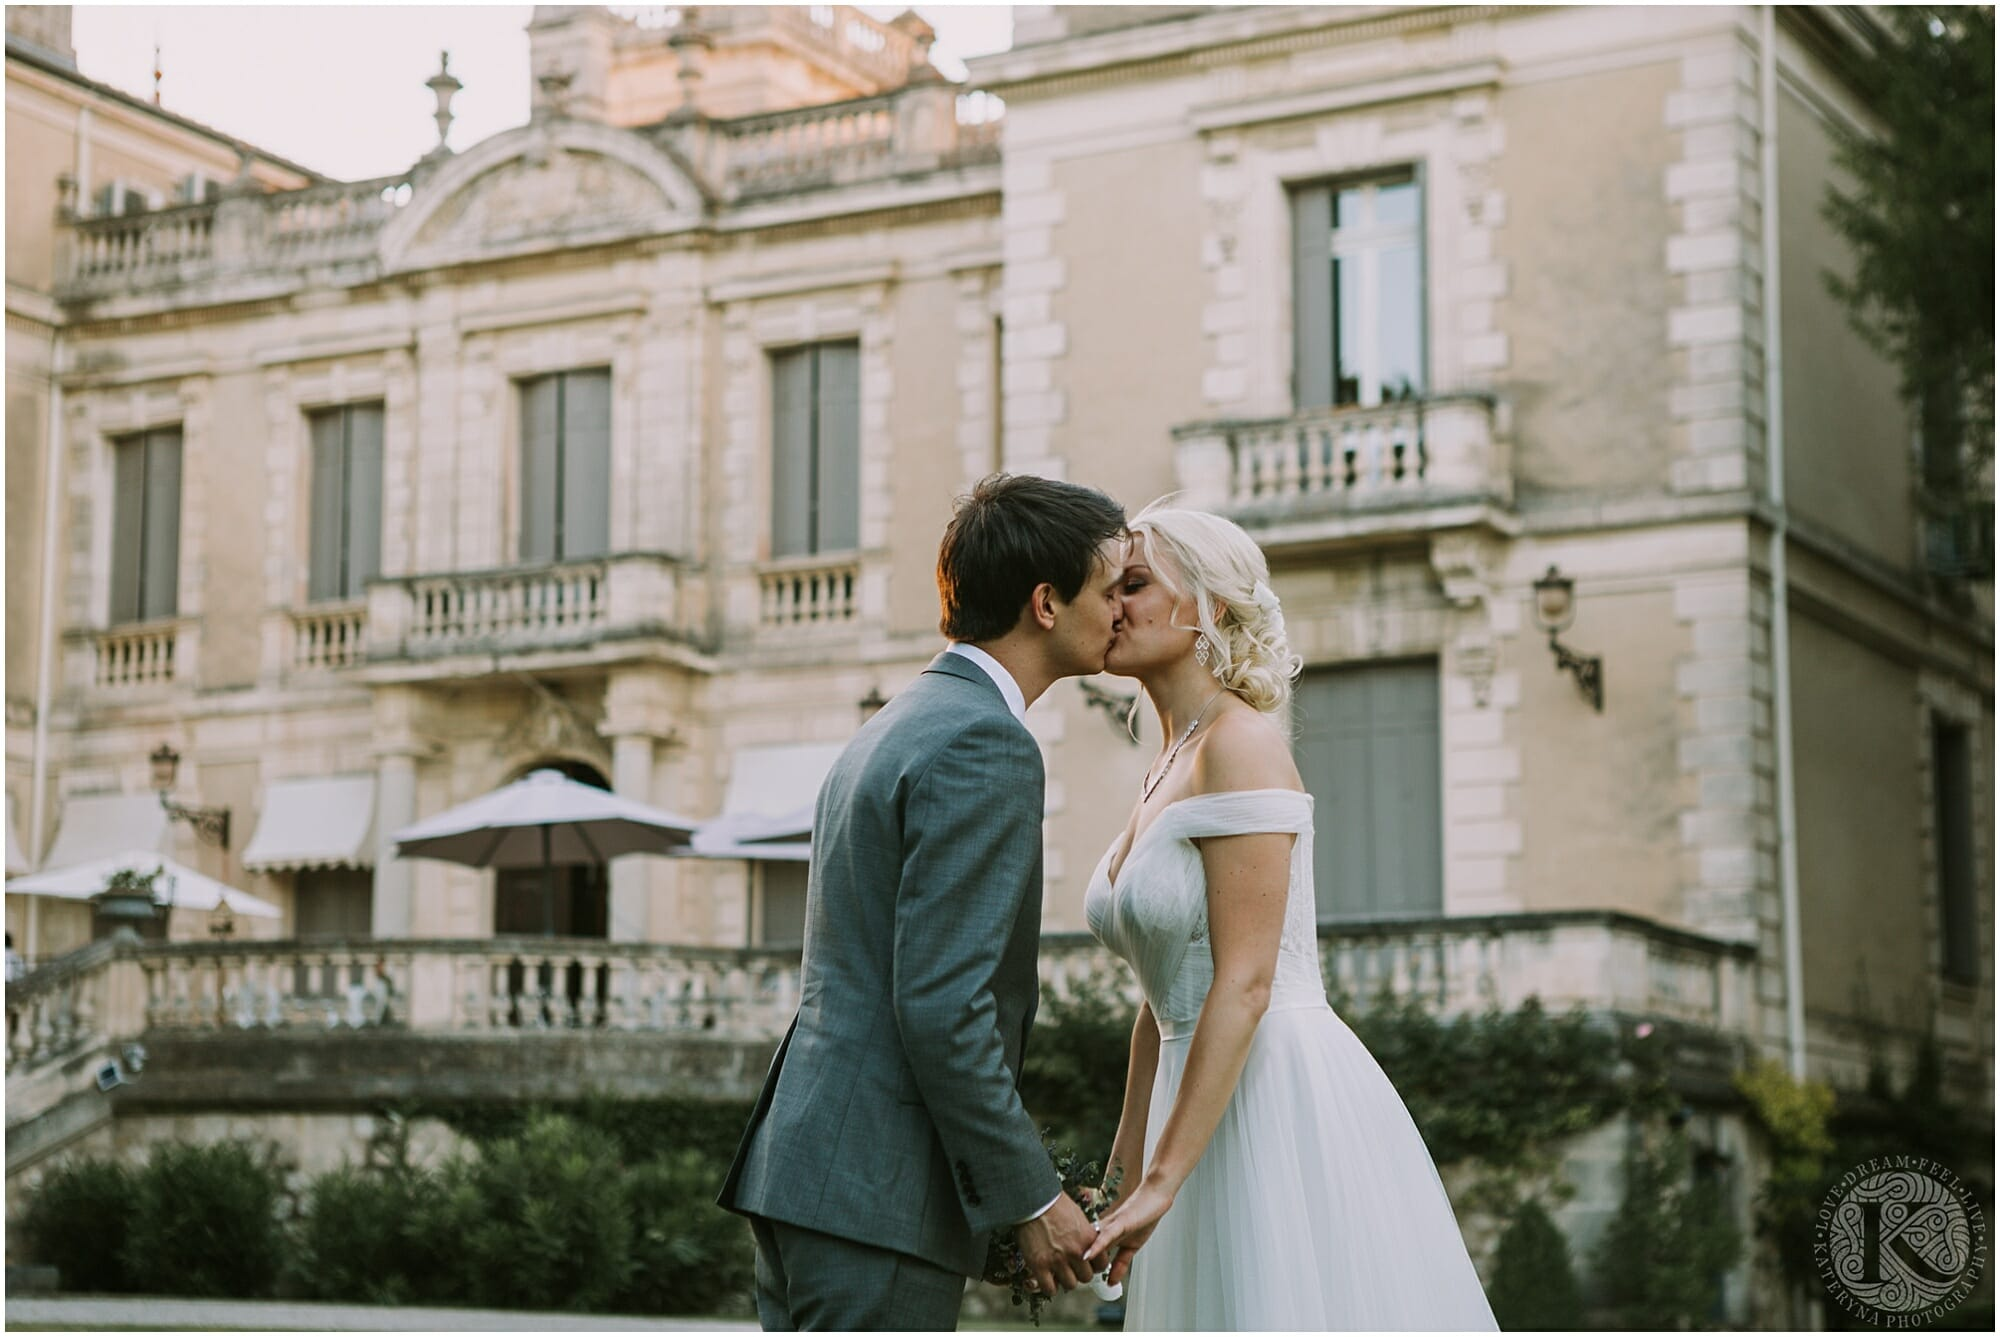 Kateryna-photos-photographe-mariage-chateau-des-3-fontaines-provence-avignon-vaucluse-sud_0101.jpg